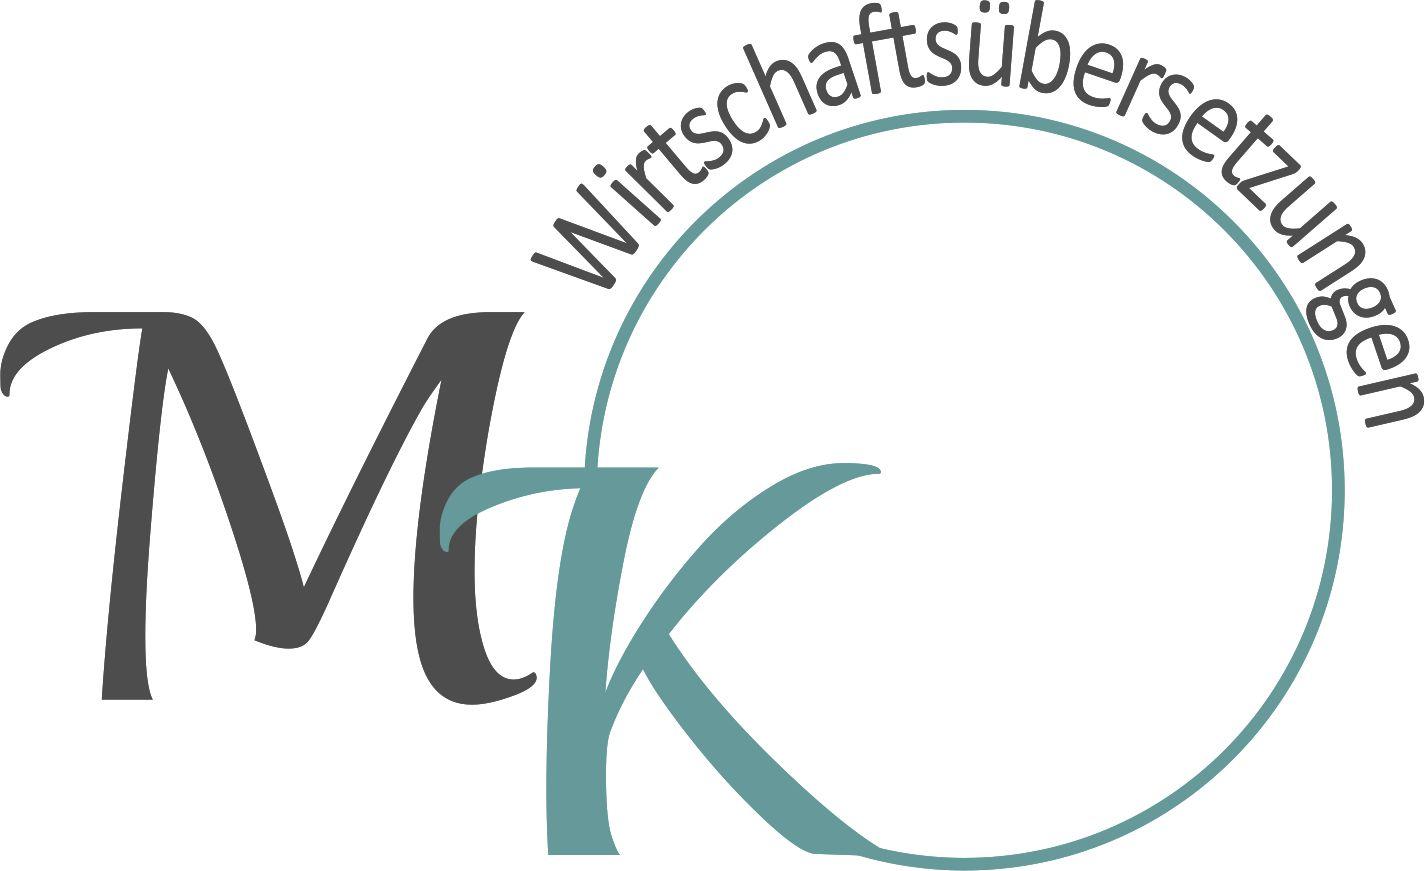 Wirtschaftsübersetzungen Marita Kretschmann